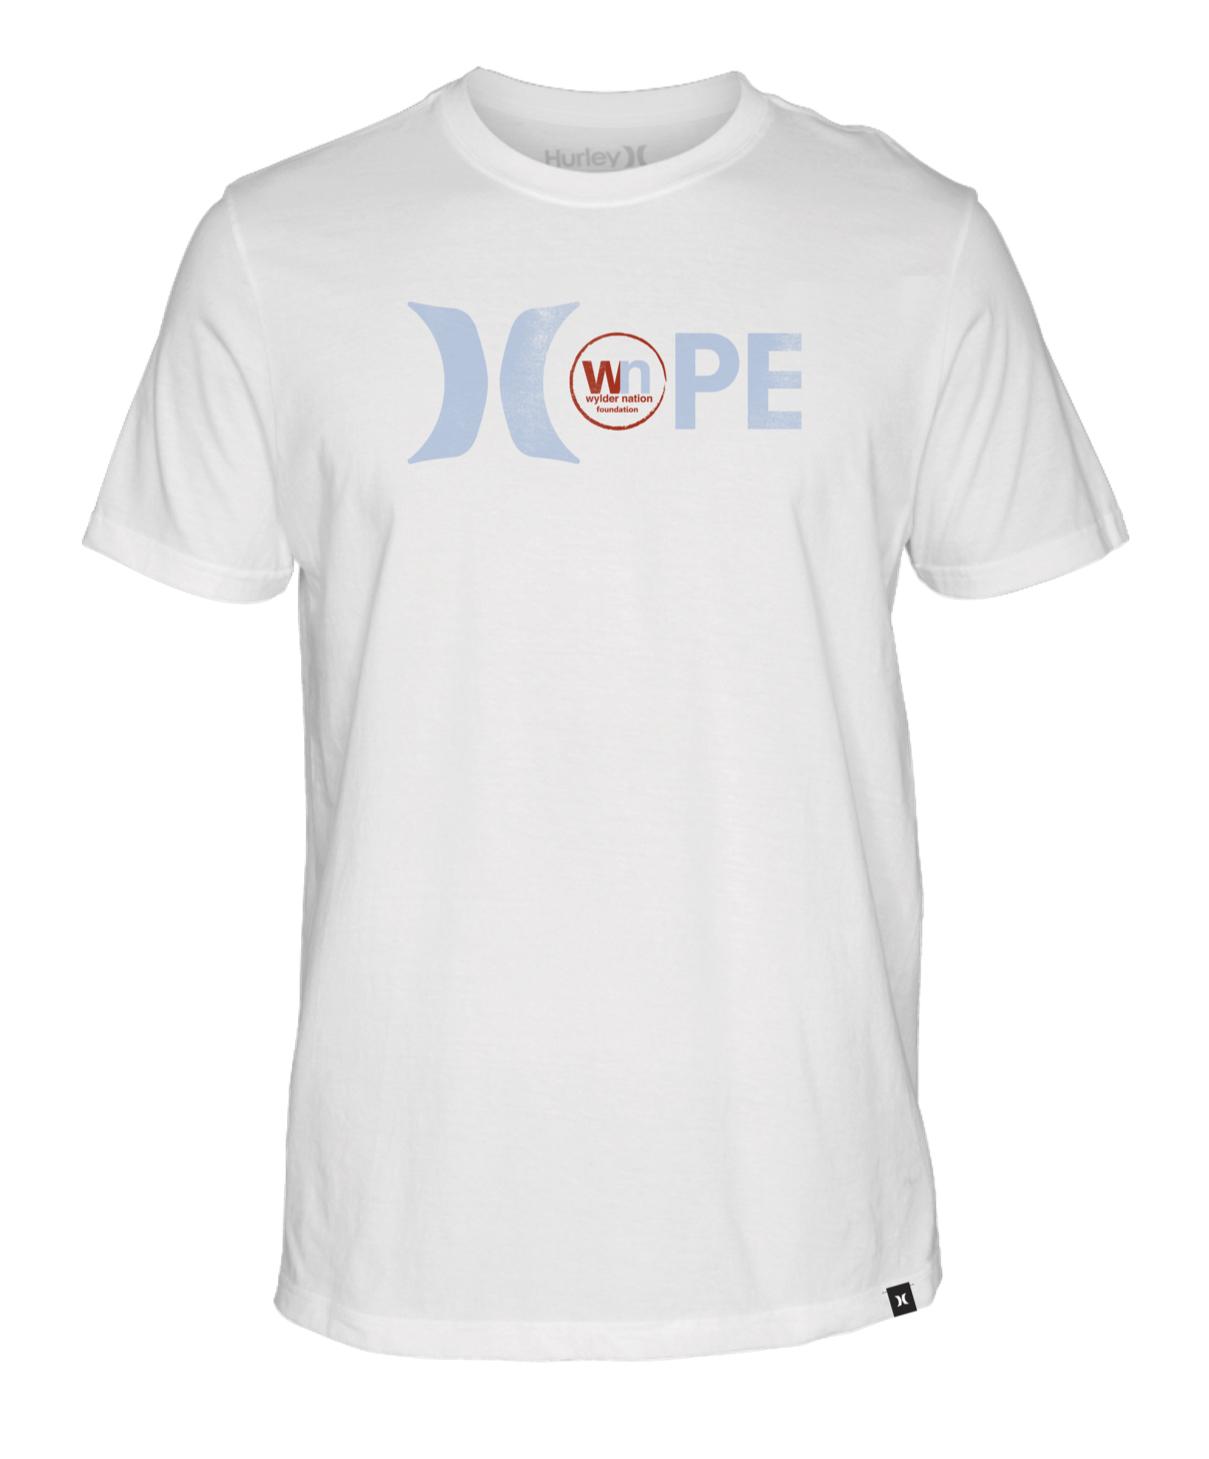 WN/Hurley Hope White Unisex Premium Dri-Fit T-Shirt